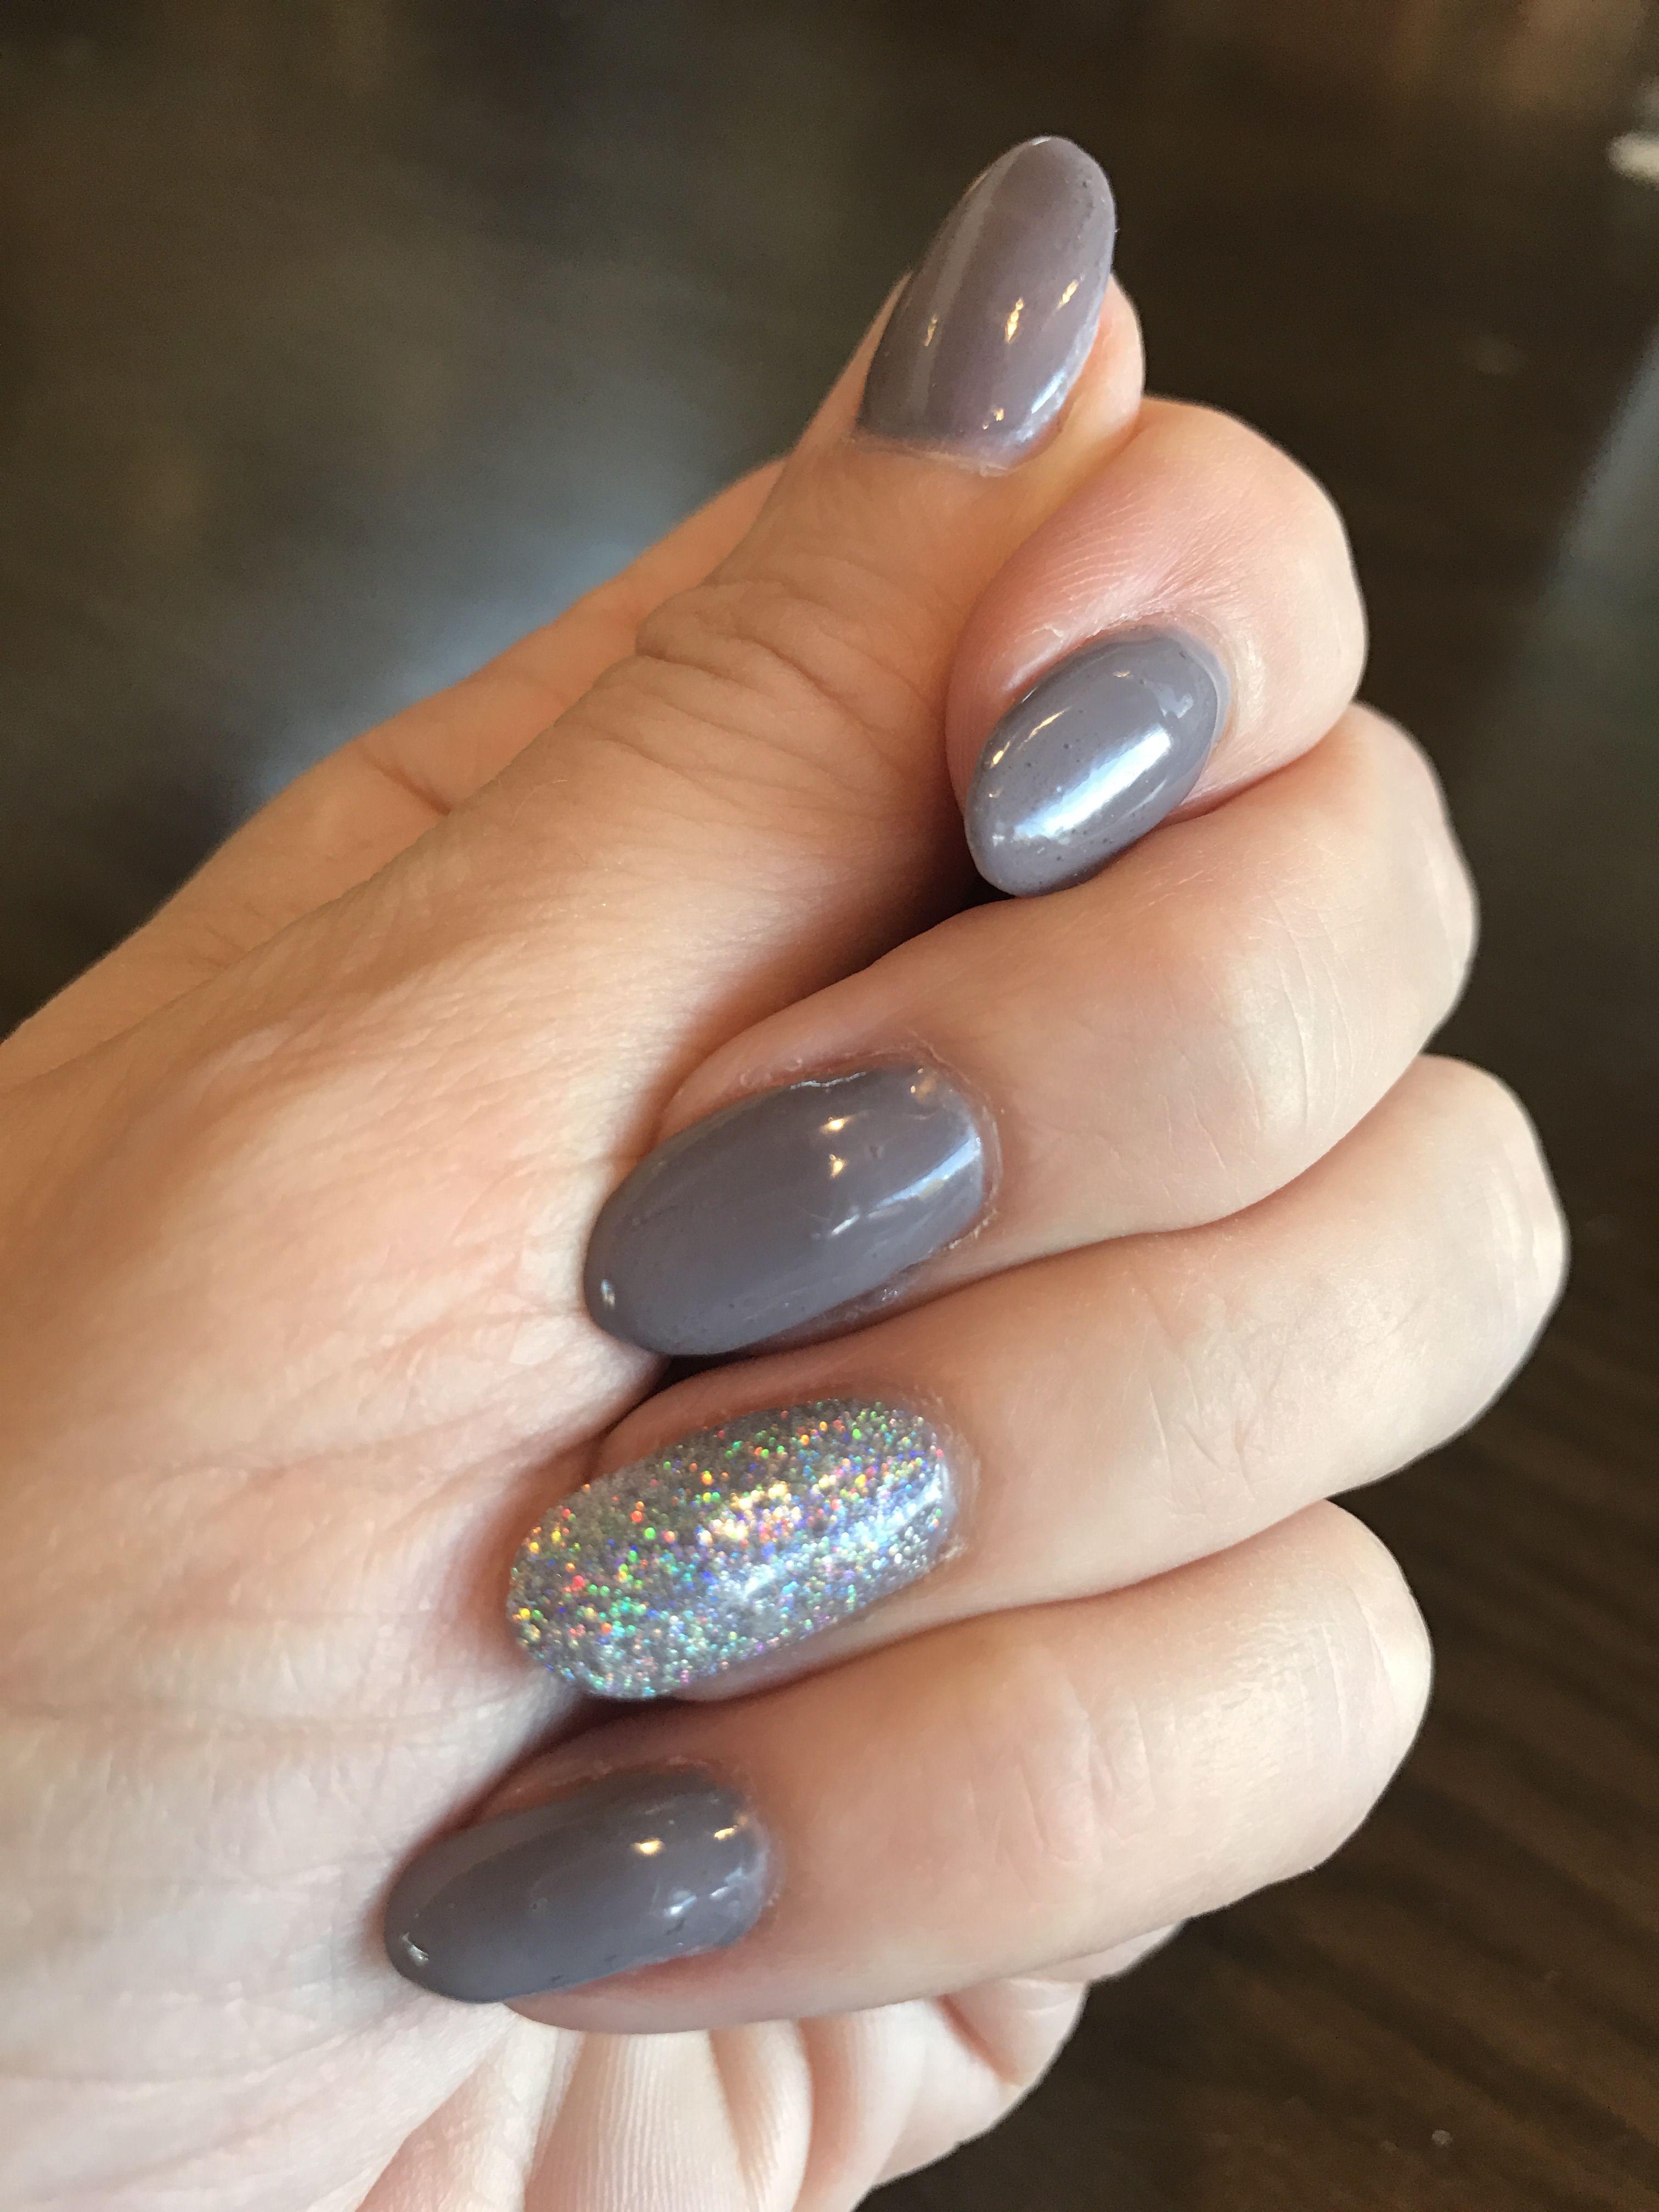 Grey Nails With Holographic Glitter Nail Accent Hard Gels Hard Gel Nails Gold Glitter Nails Purple Acrylic Nails